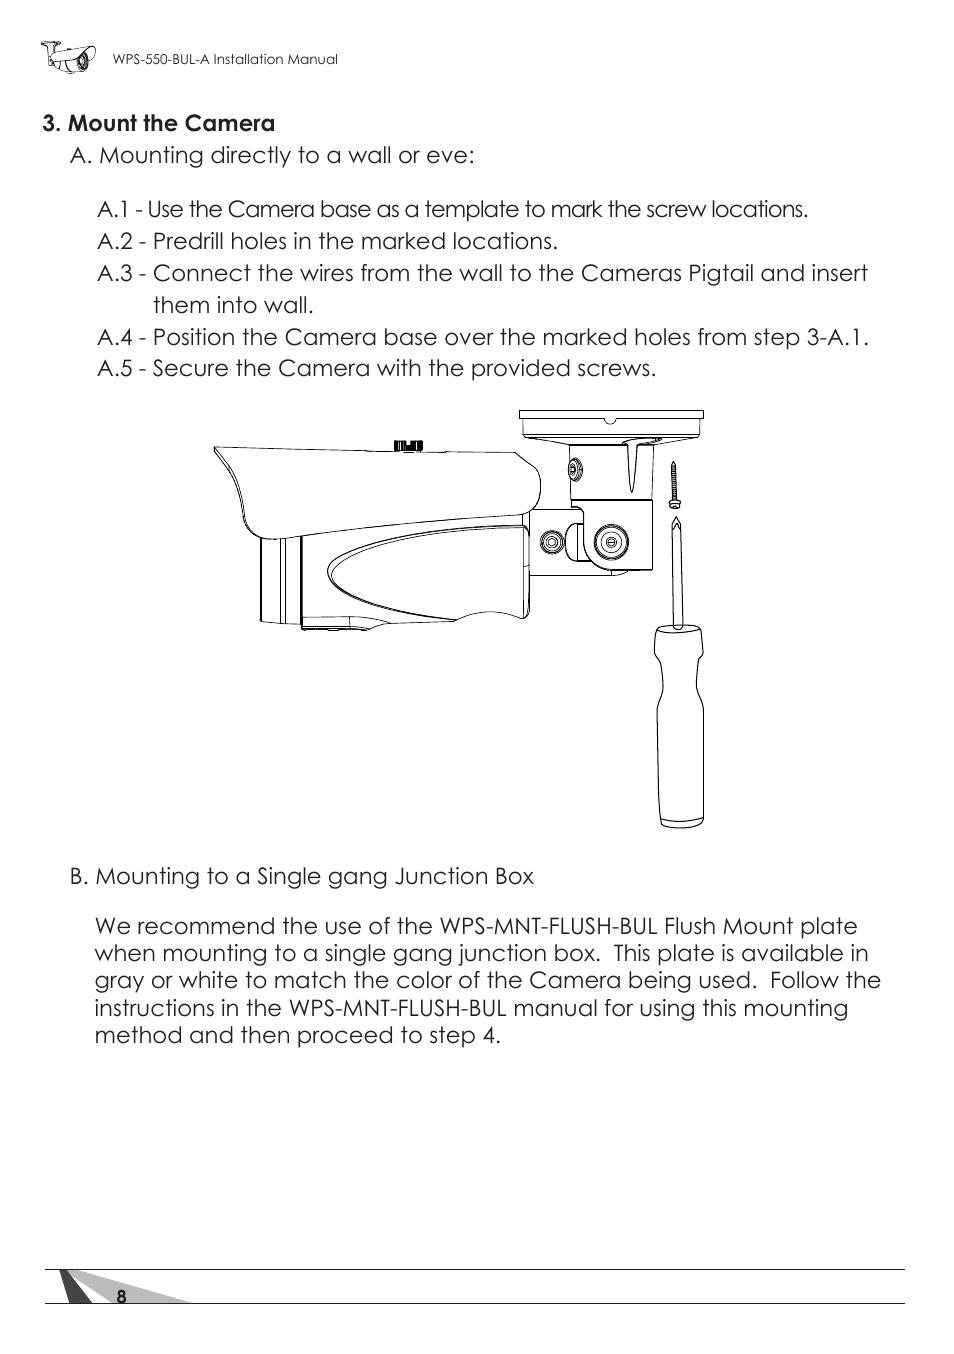 medium resolution of staub electronics wps 550 bul a wirepath surveillance 550 series bullet analog outdoor camera with ir 600 tvl user manual page 8 30